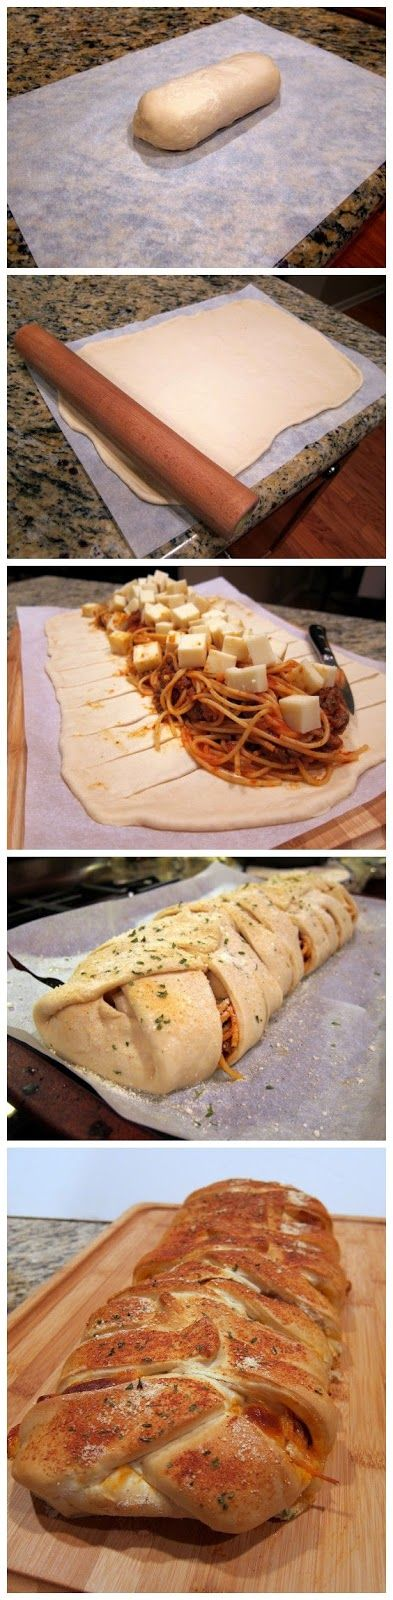 Braided Spaghetti Bread - joysama images